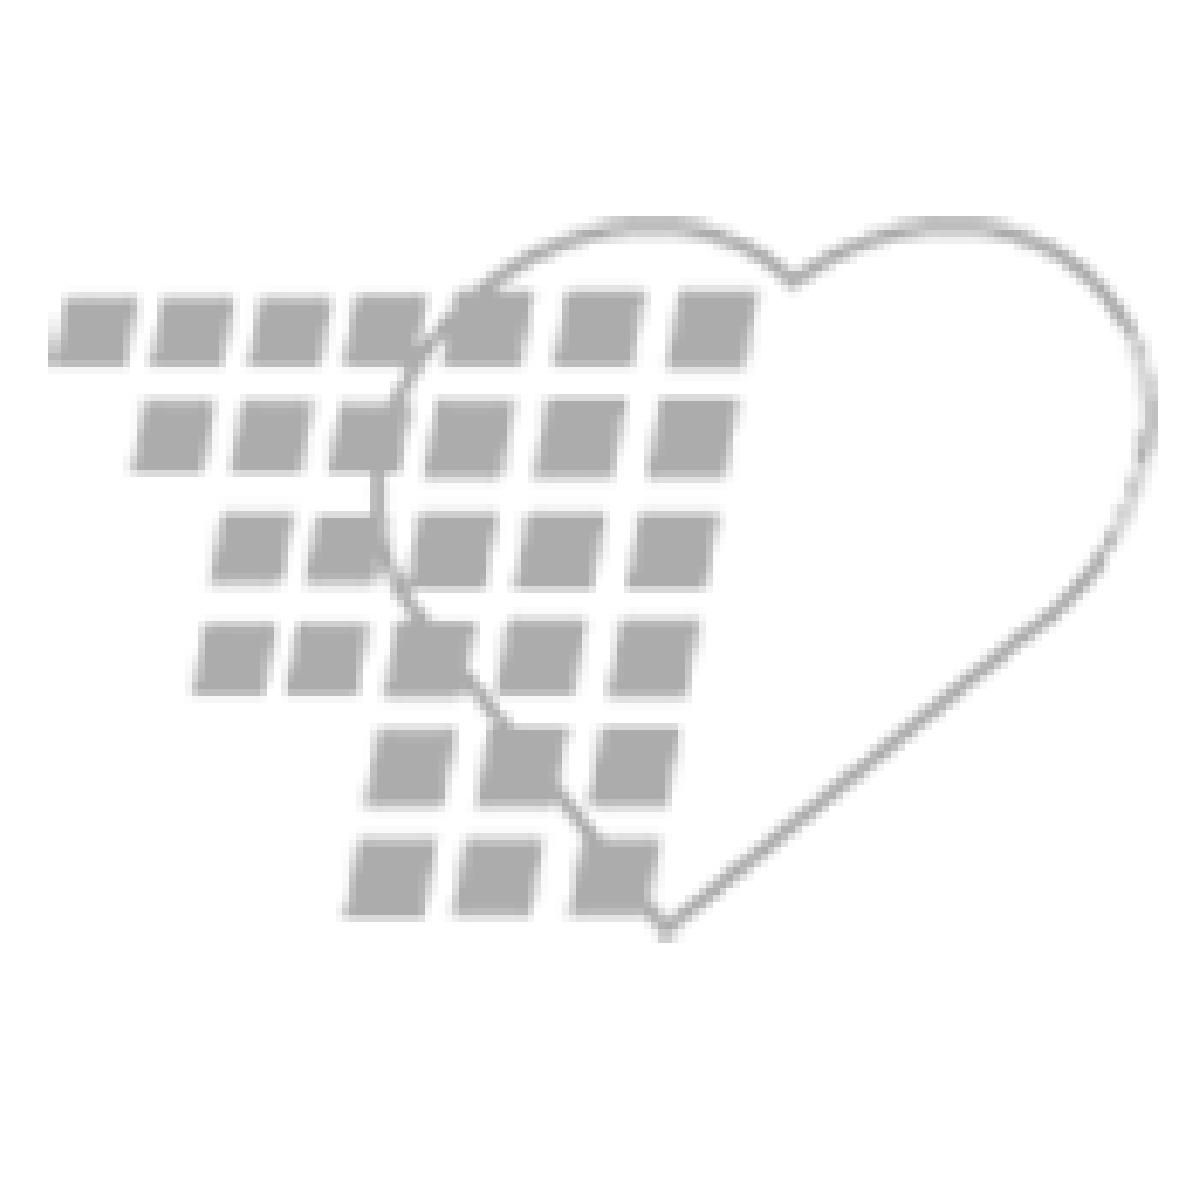 14-17-0725 Nasco Life/form® Simulated Burns